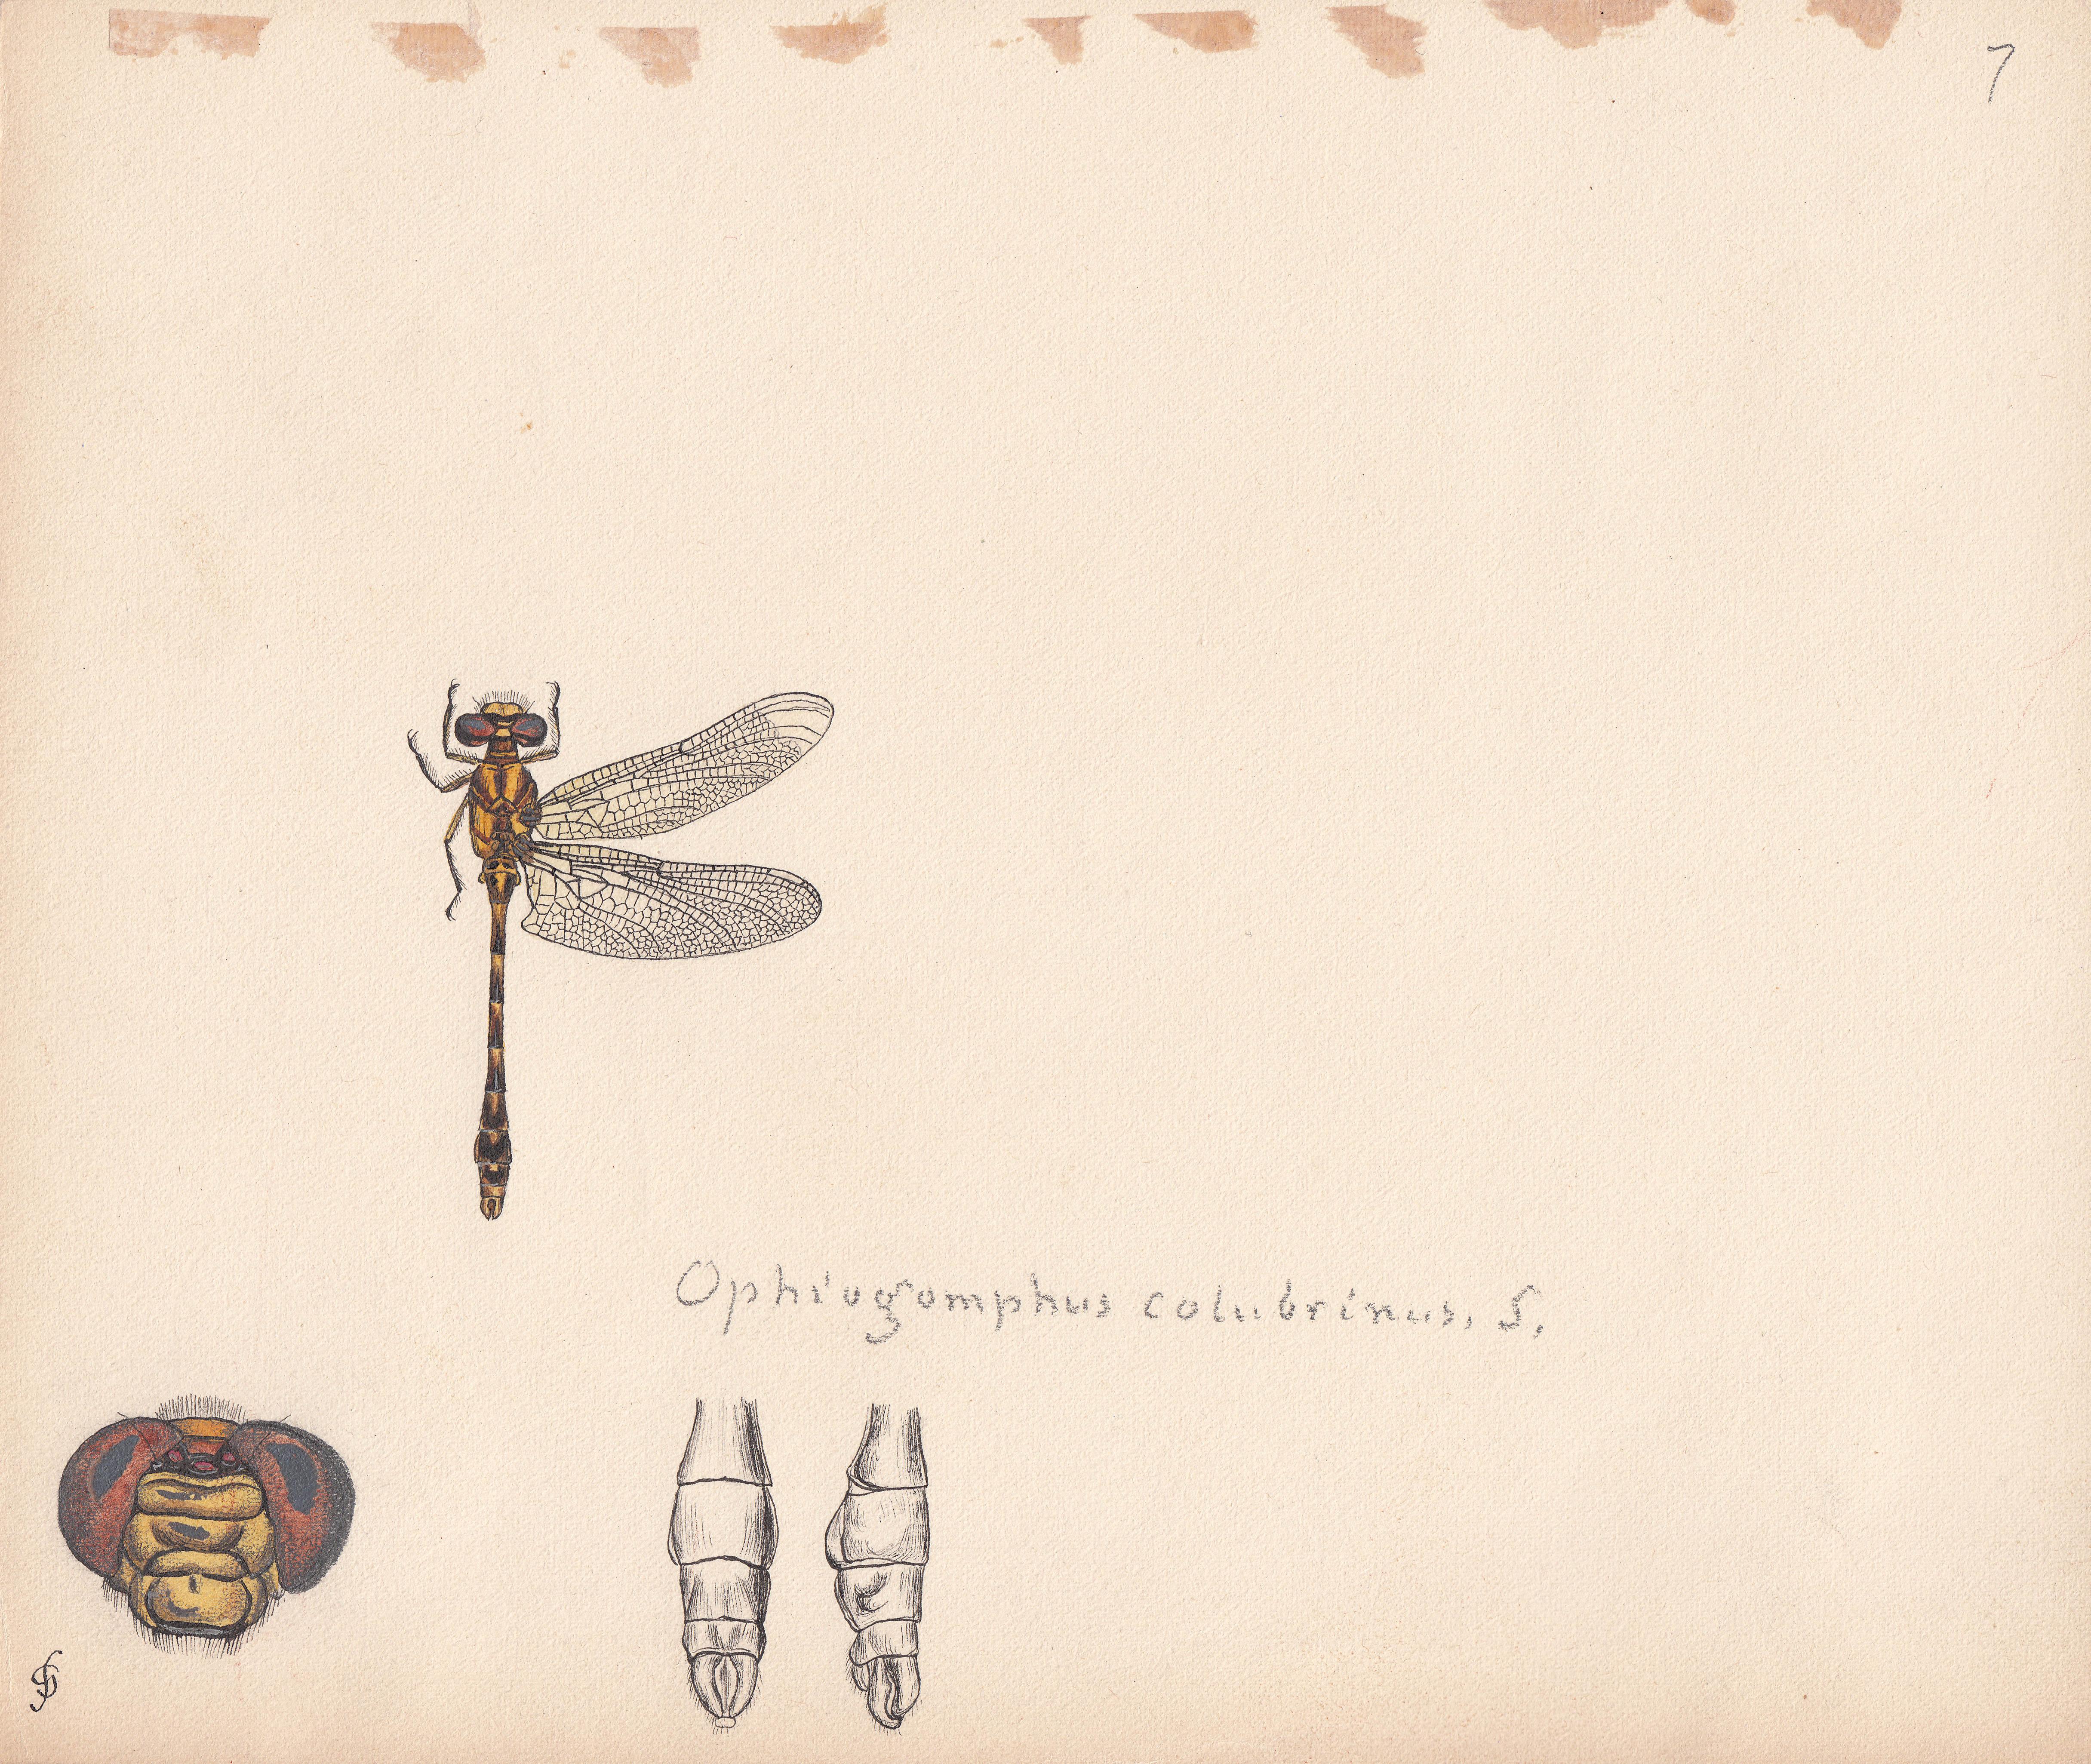 Ophiogomphus colubrinus.jpg